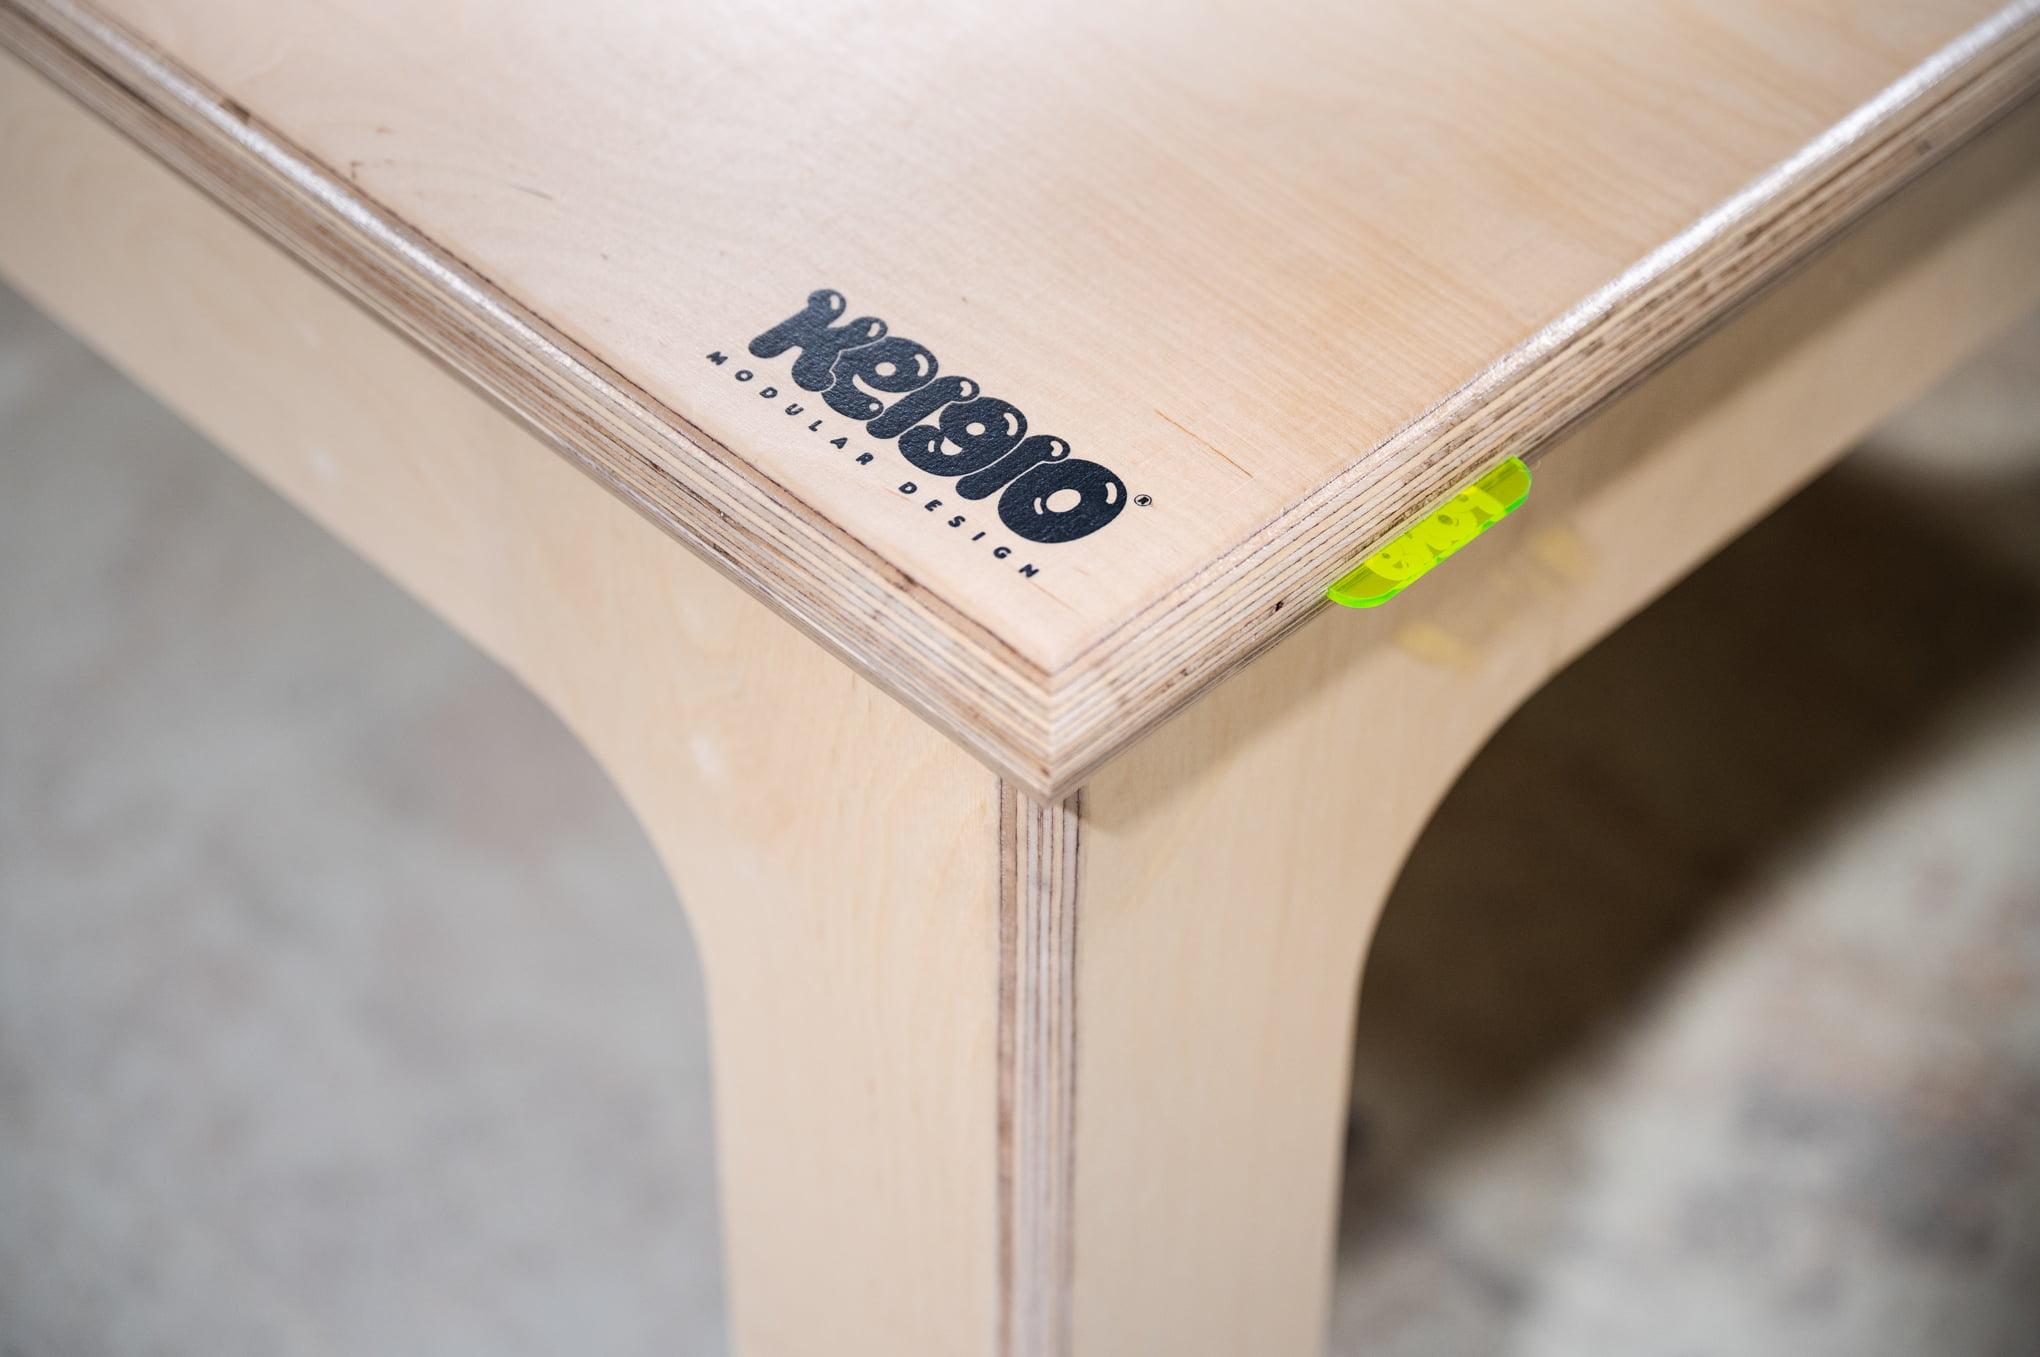 KEIGIO PONG folding table ping pong table customized screen printings table with wheels - KEIGIO PONG tavolo pieghevole tavolo da ping pong personalizzato serigrafie tavolo con ruote -KEIGIO PONG mesa plegable mesa de ping pong personalizada serigrafía mesa con ruedas